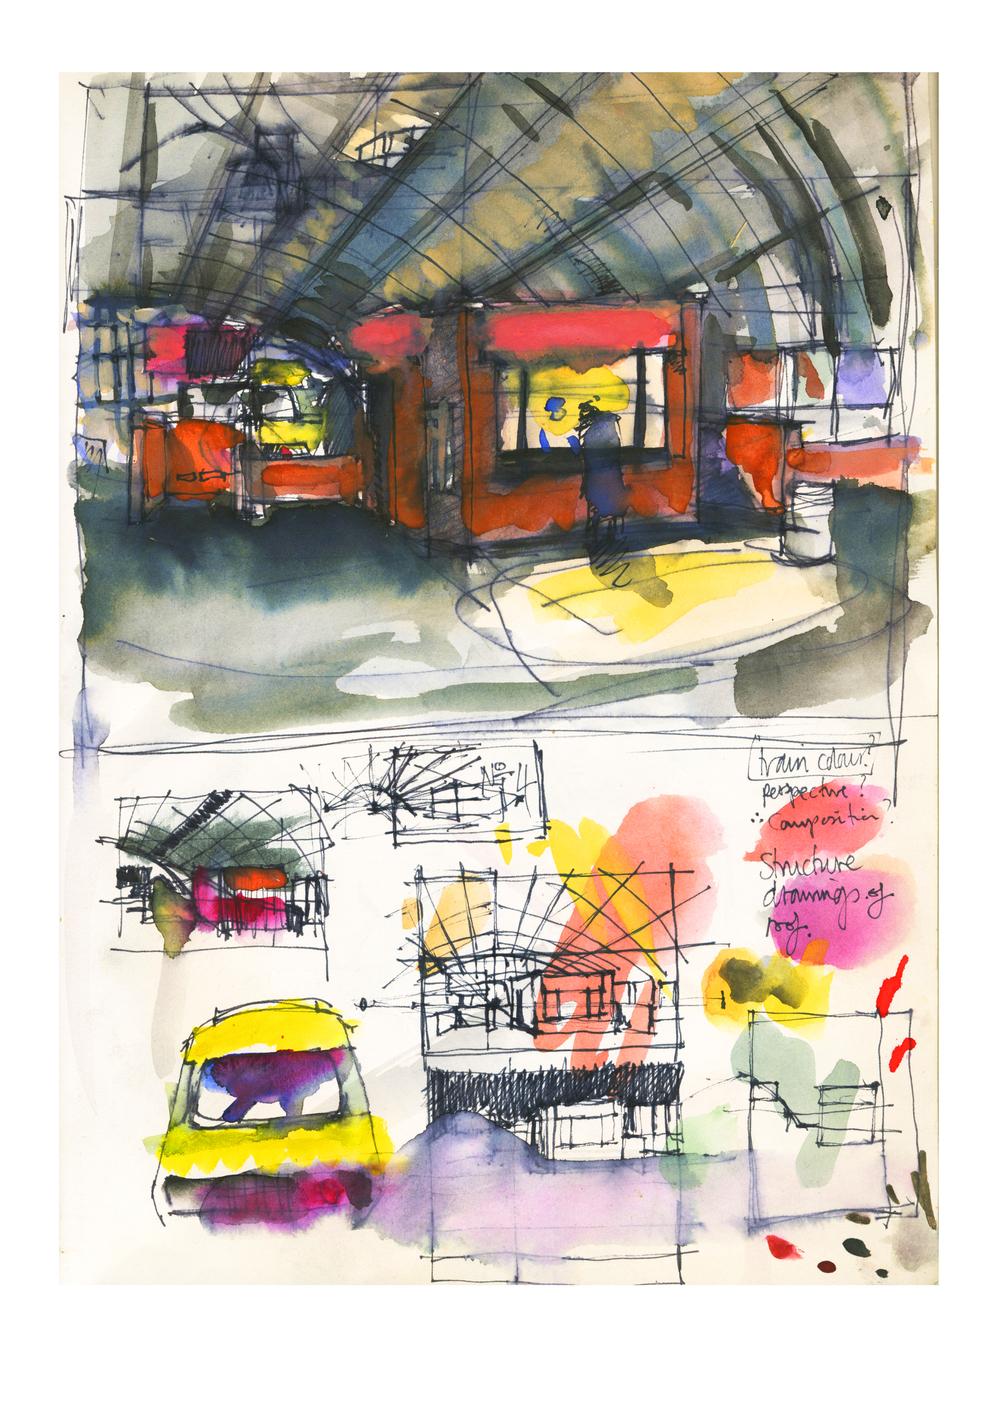 Preparatory work at Euston Station